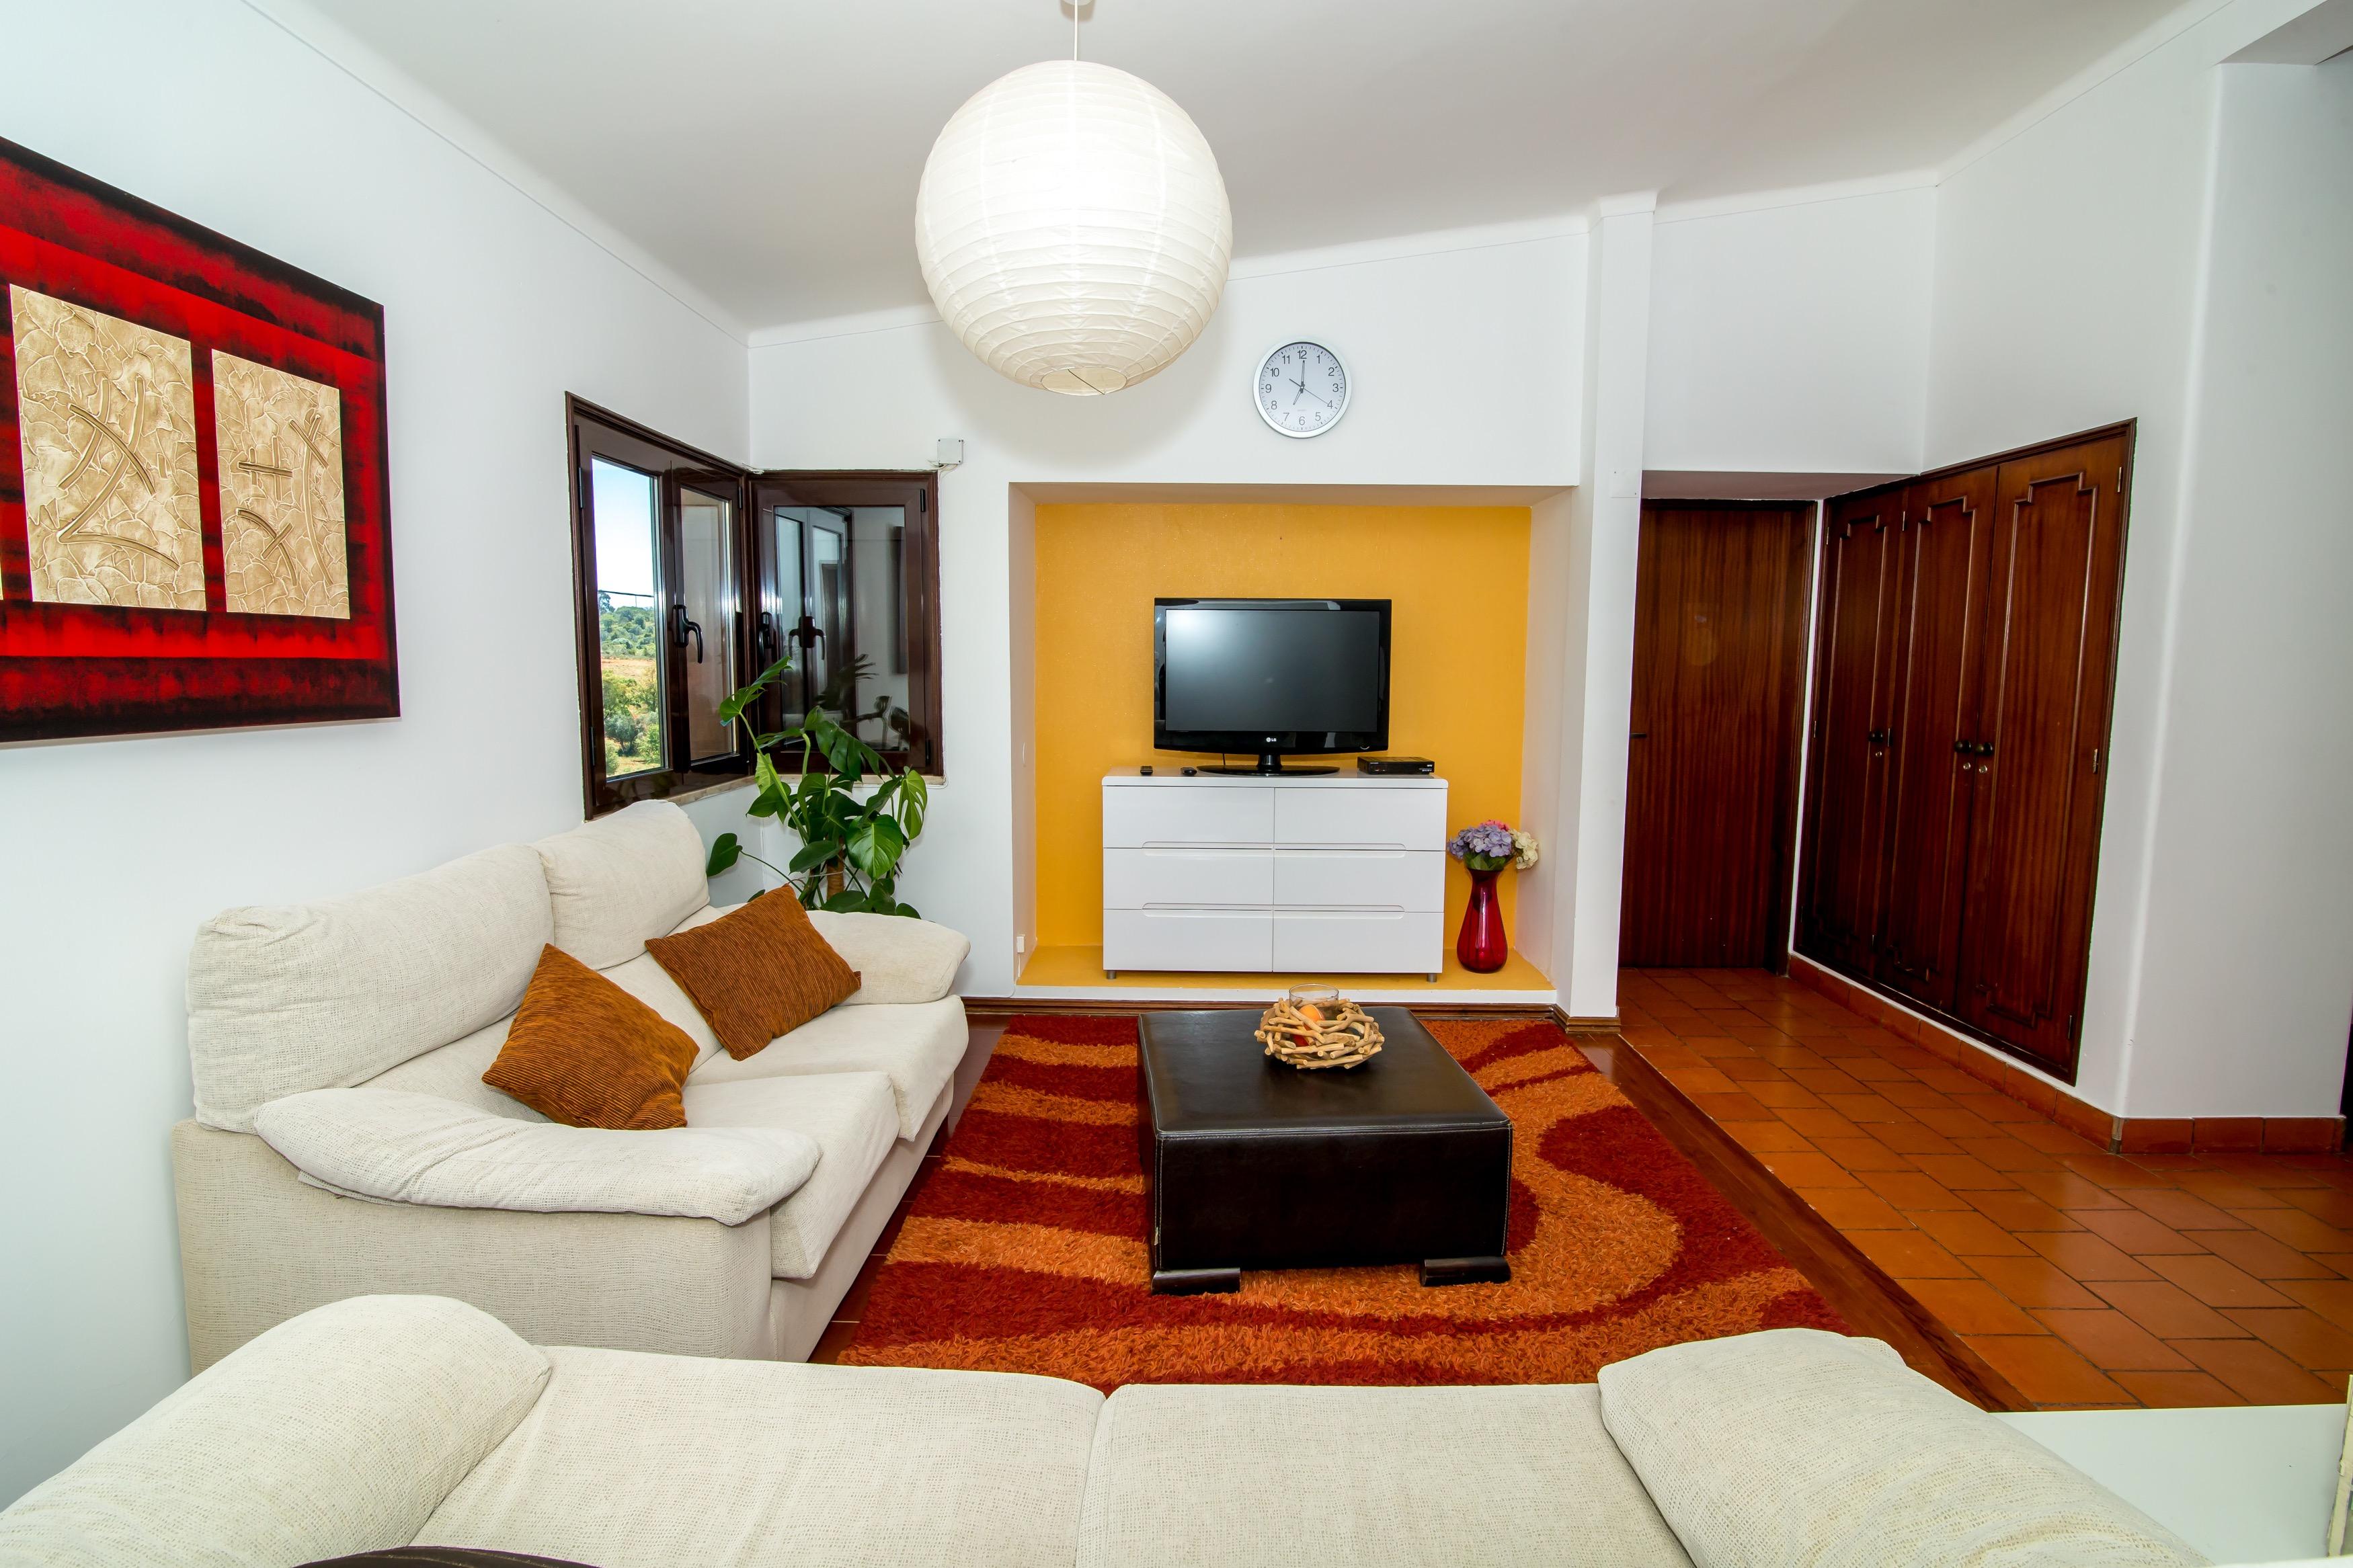 Holiday apartments and villas for rent, Villa Barrancos in Guia, Portugal Algarve, REF_IMG_5770_5783